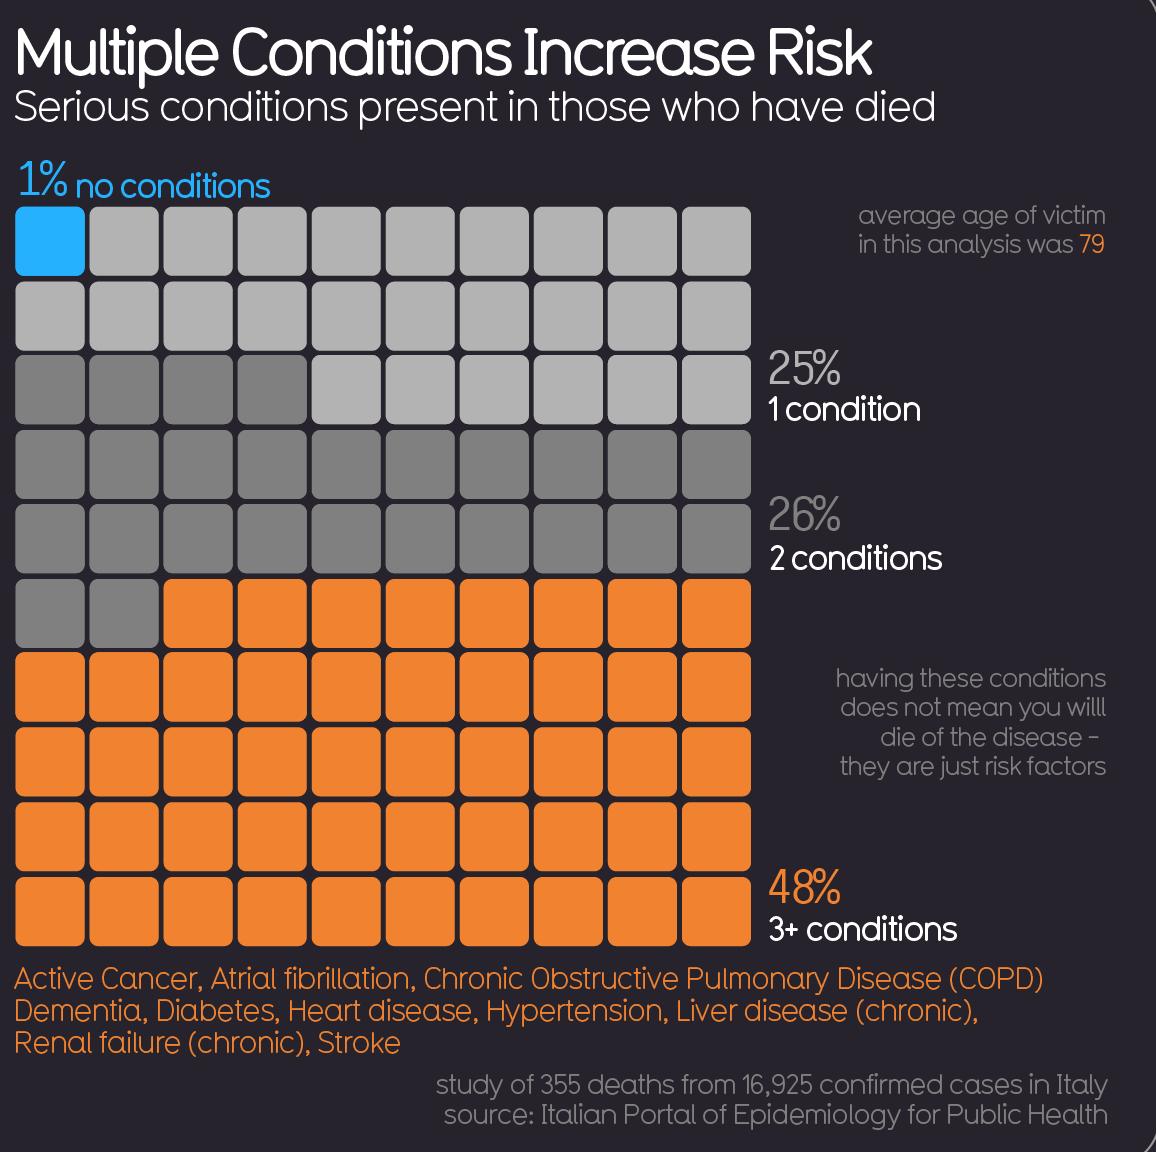 CV19 Conditions +Risk